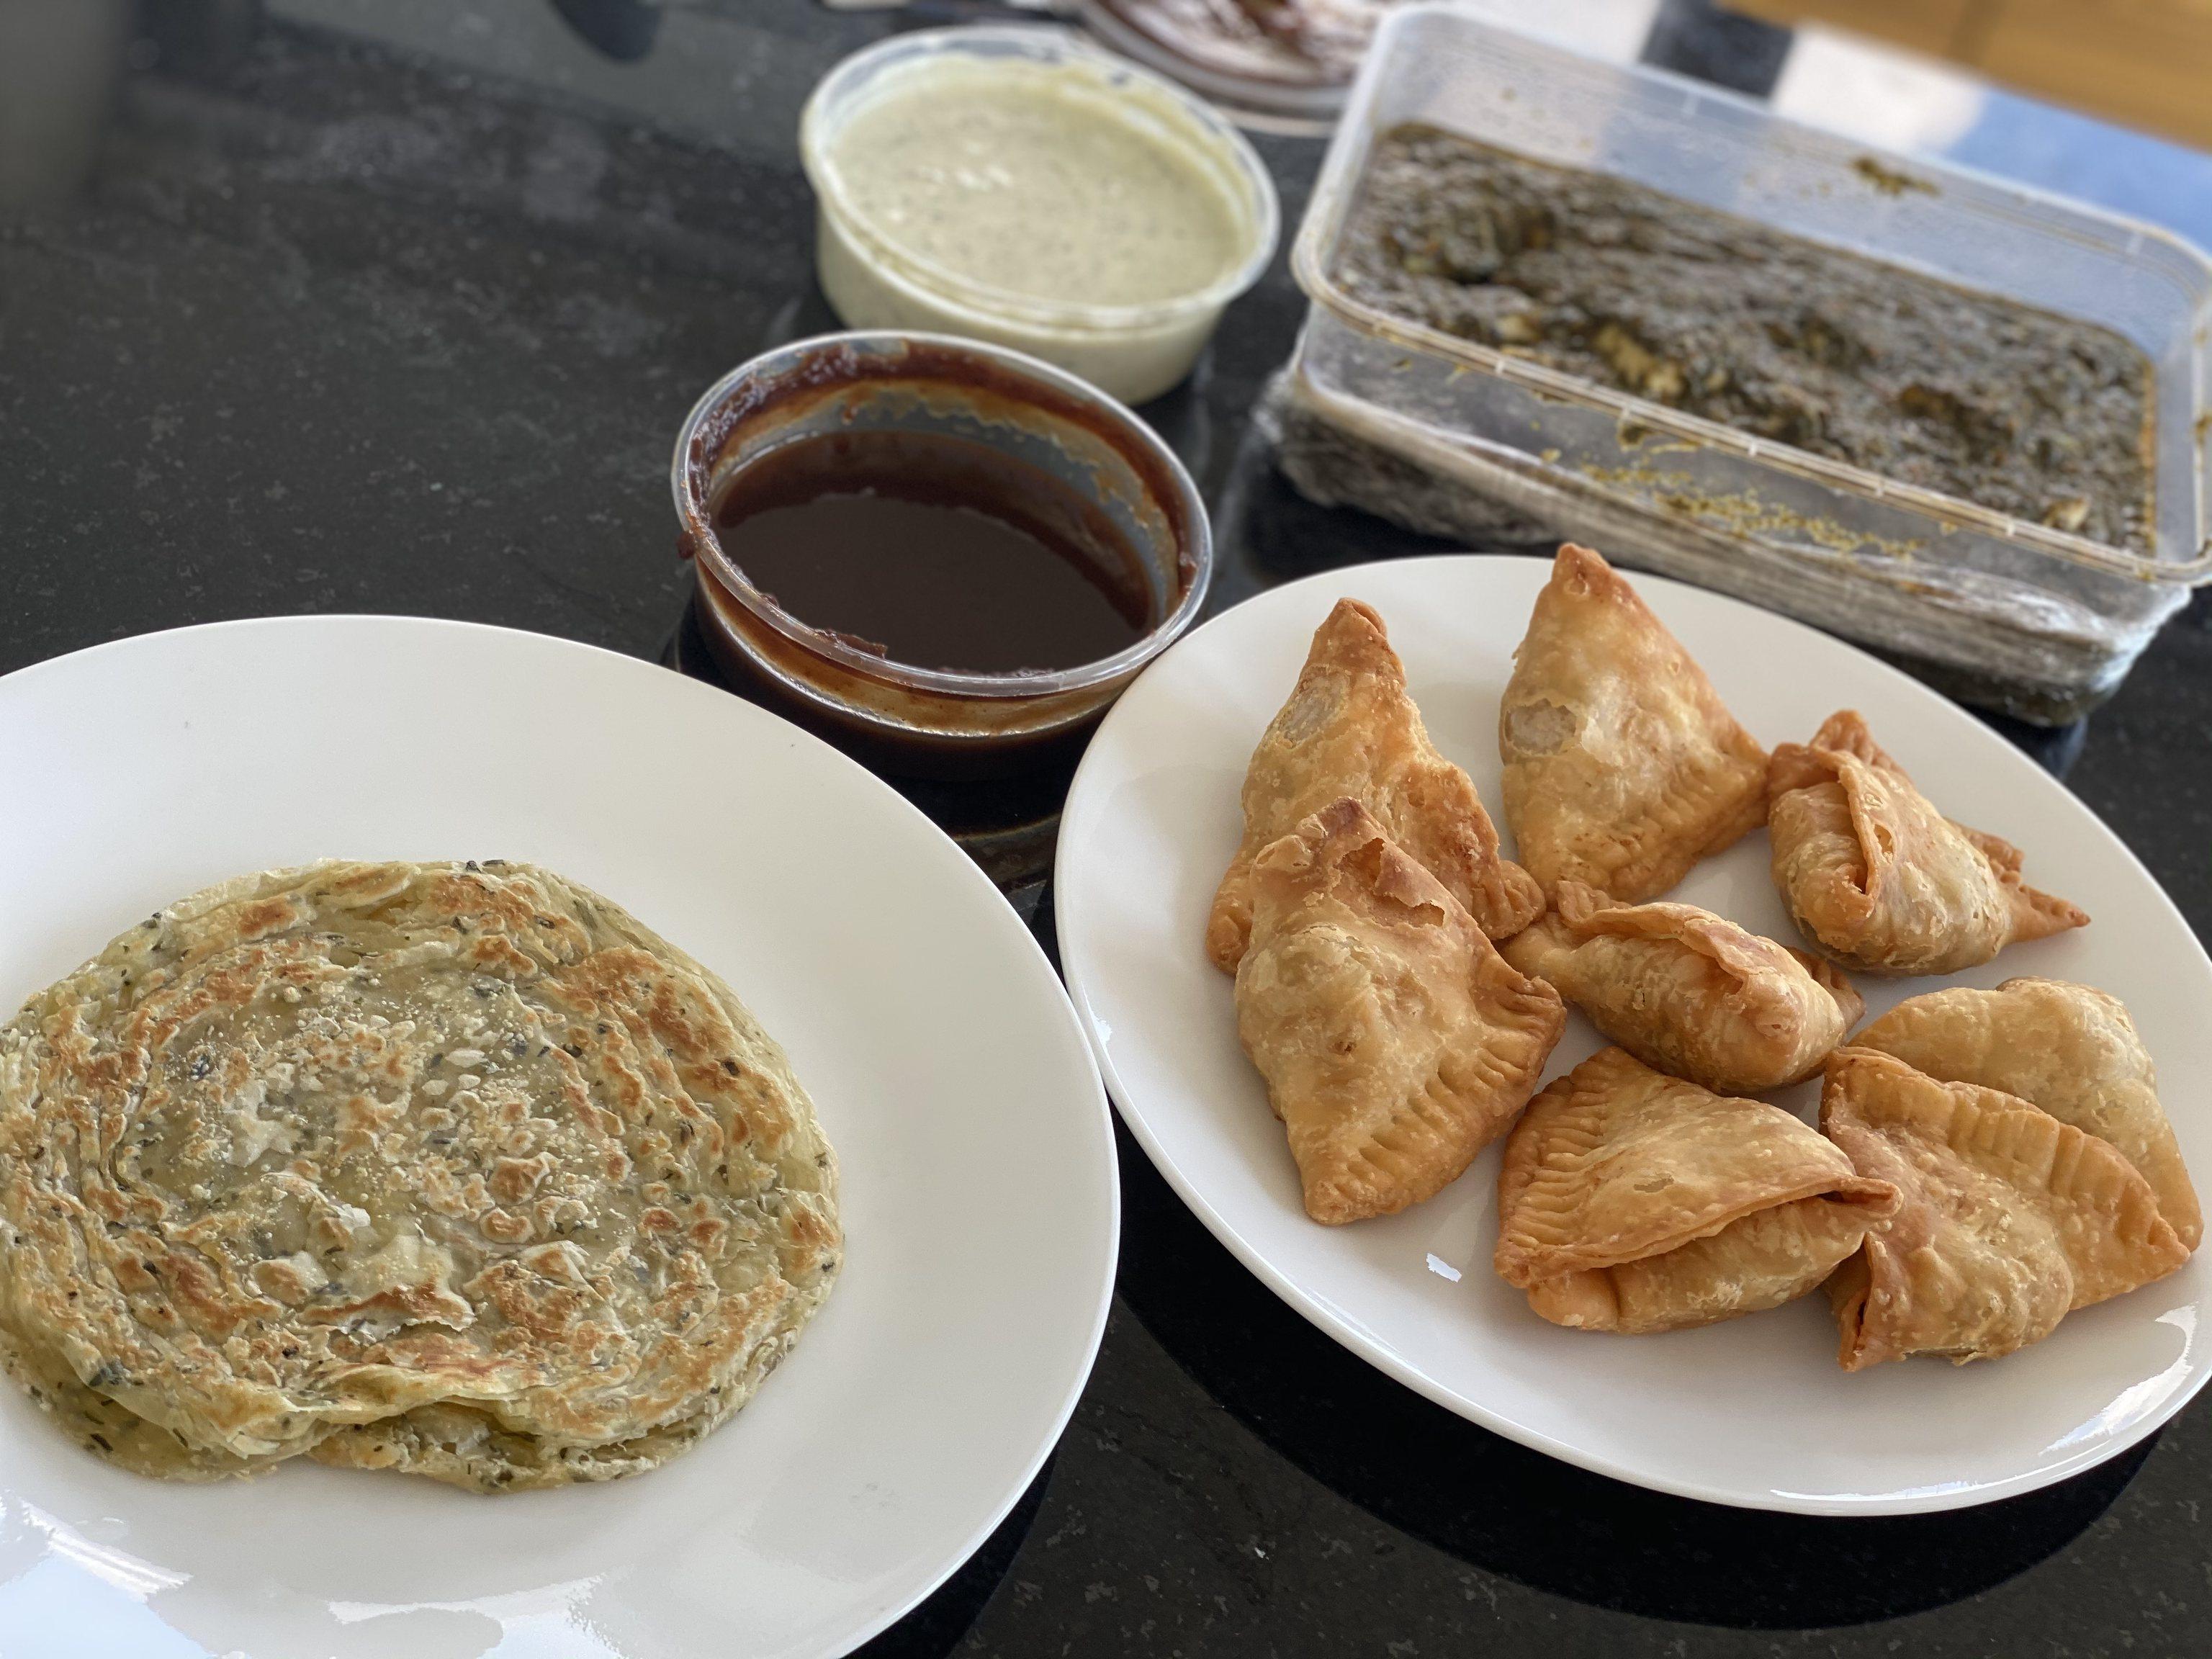 biryani-bros-review-indian-food-home-delivery.jpg